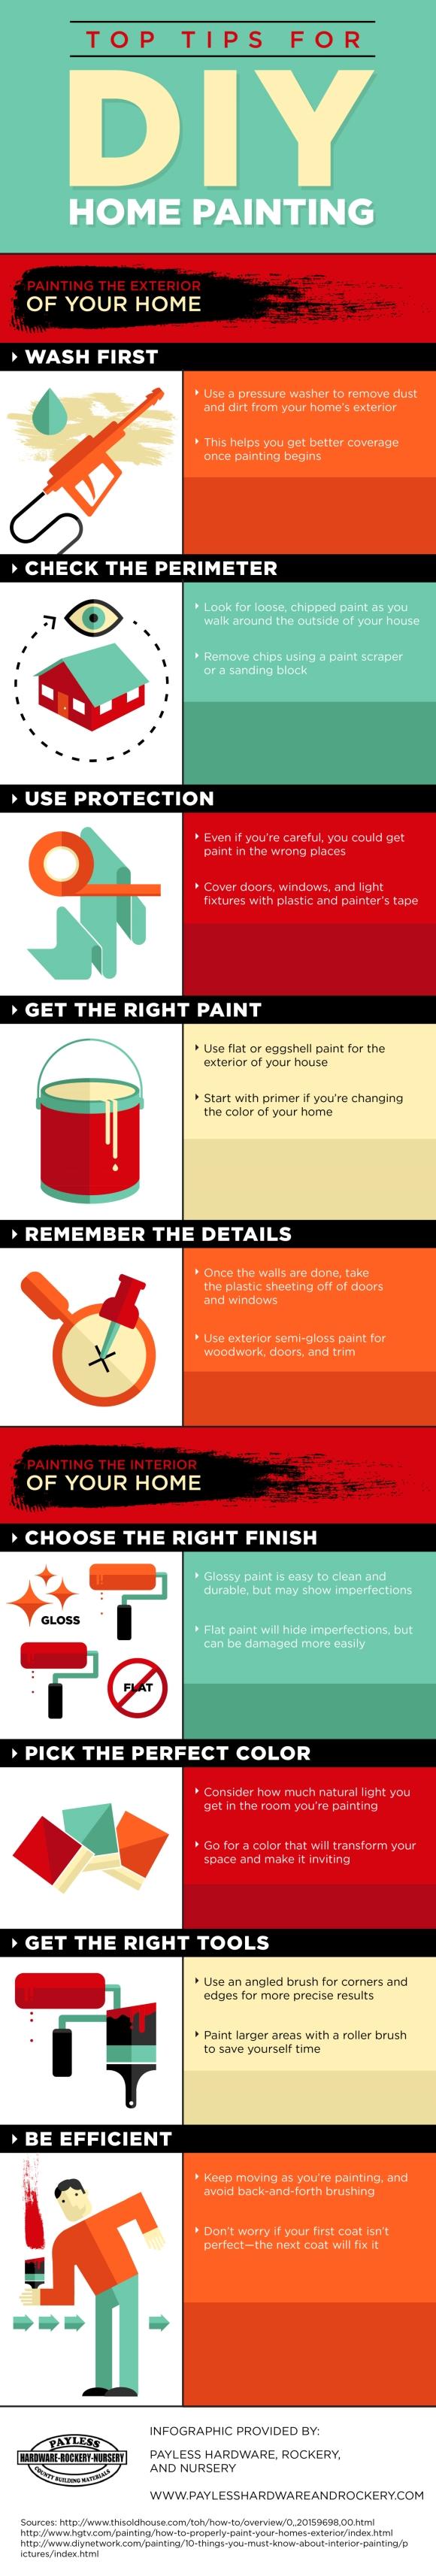 tips for DIY